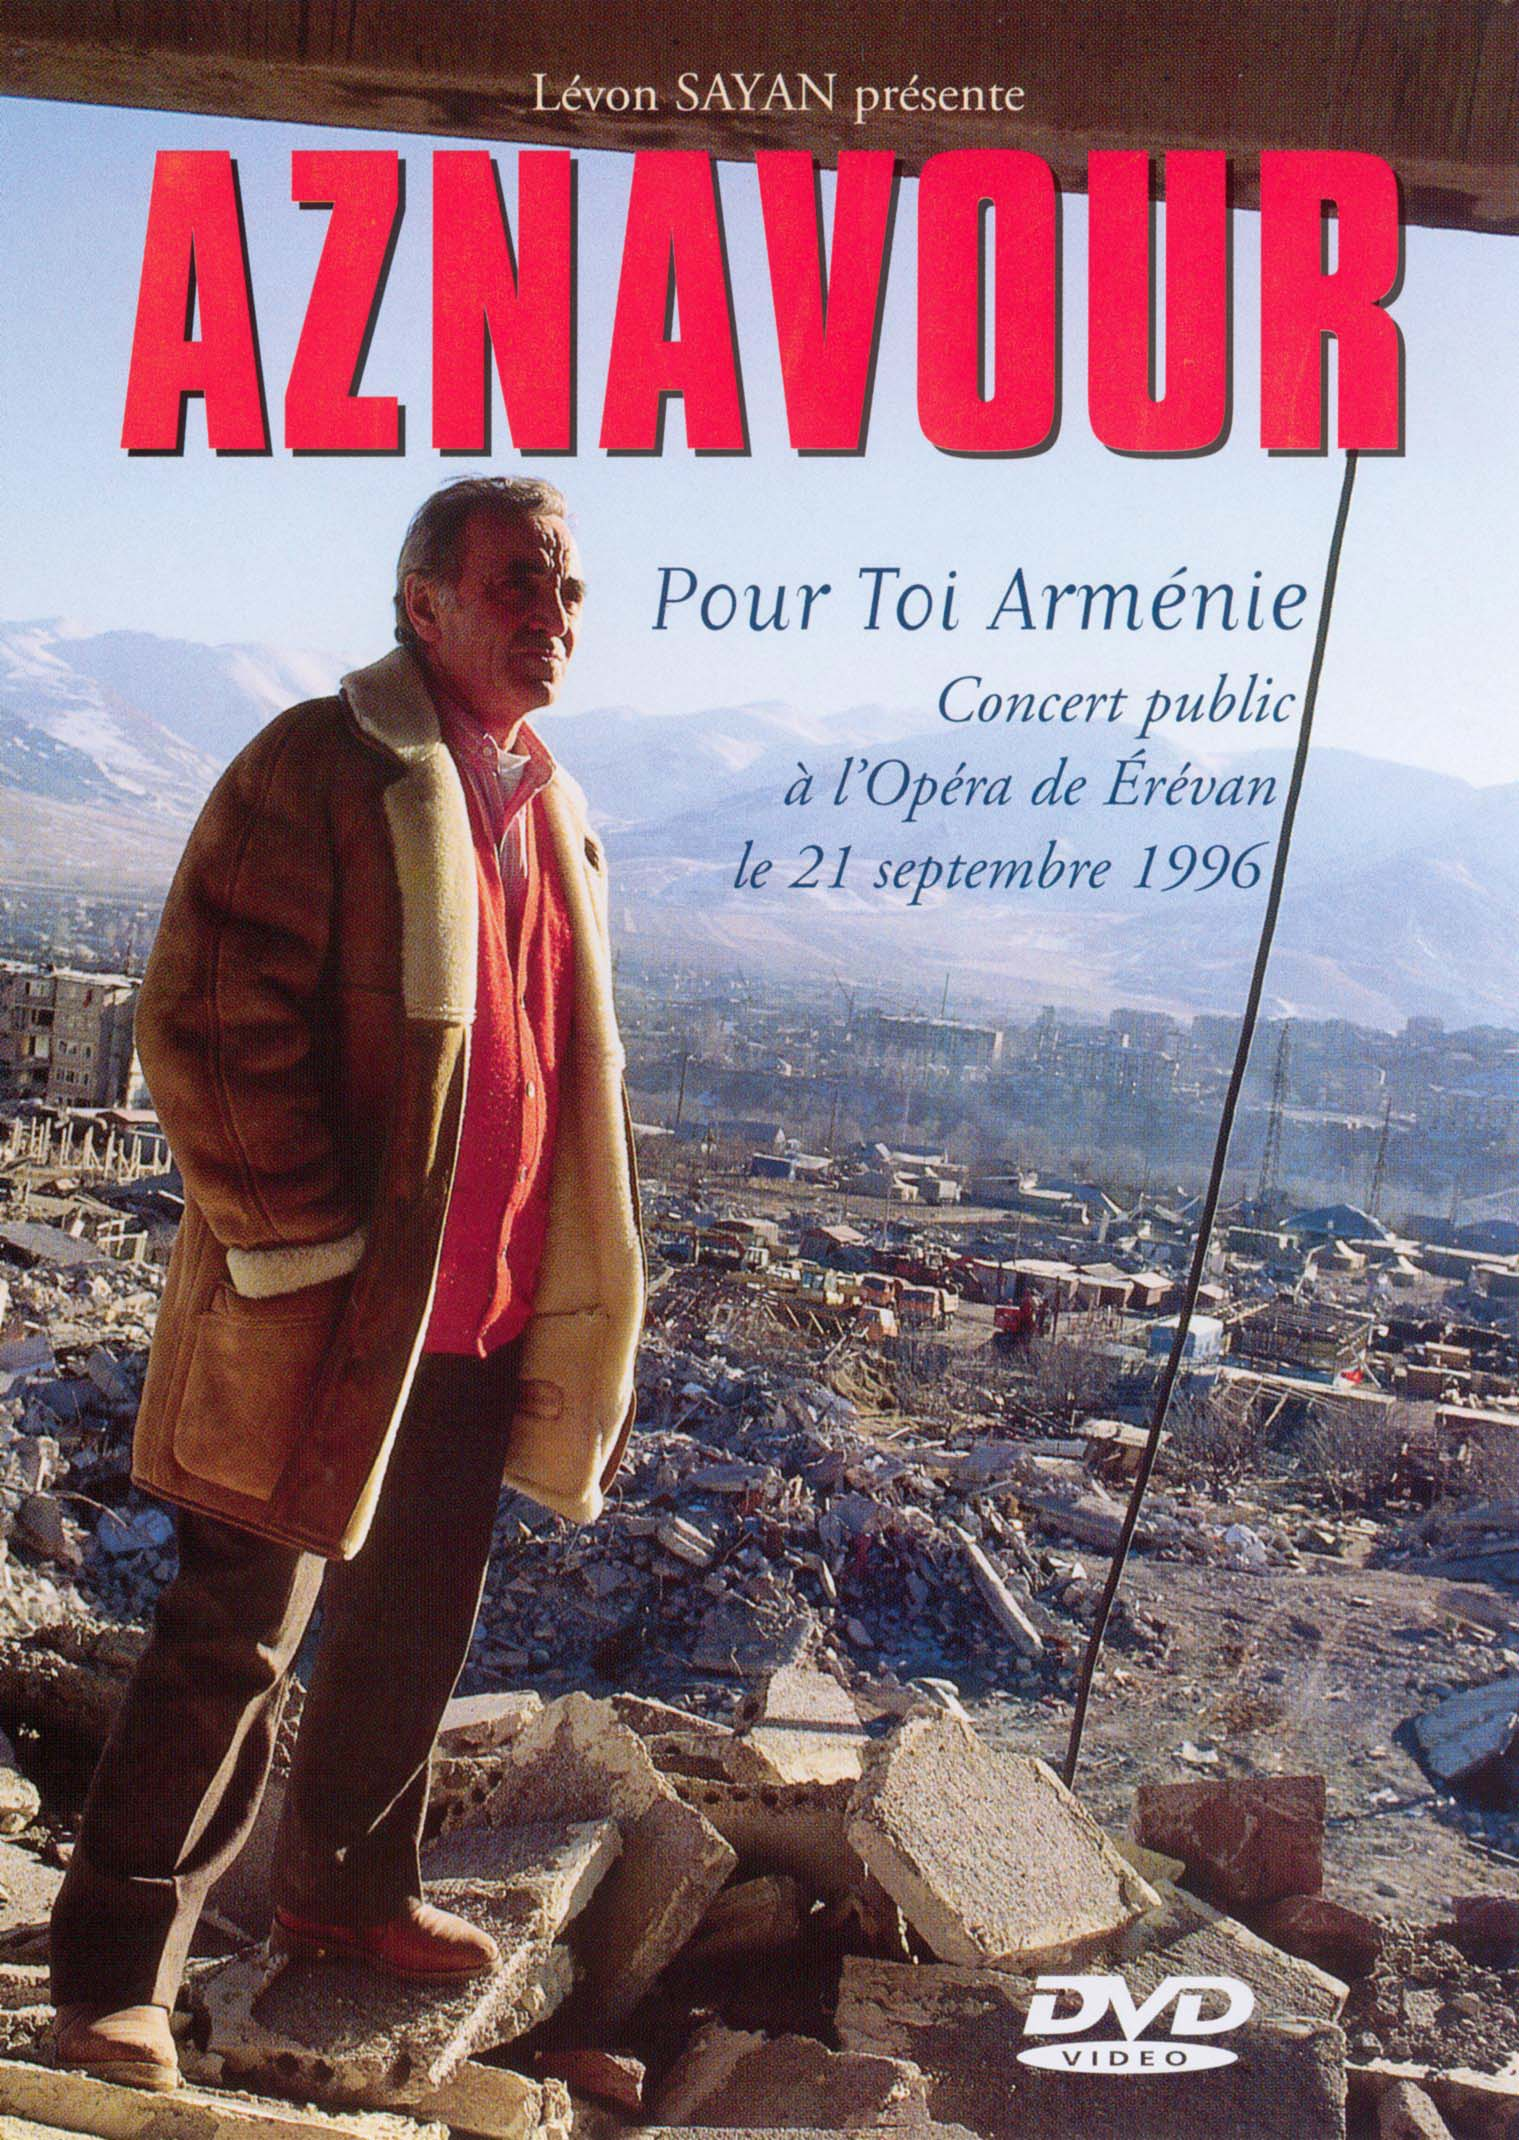 Charles Aznavour: Pour Toi Arménie